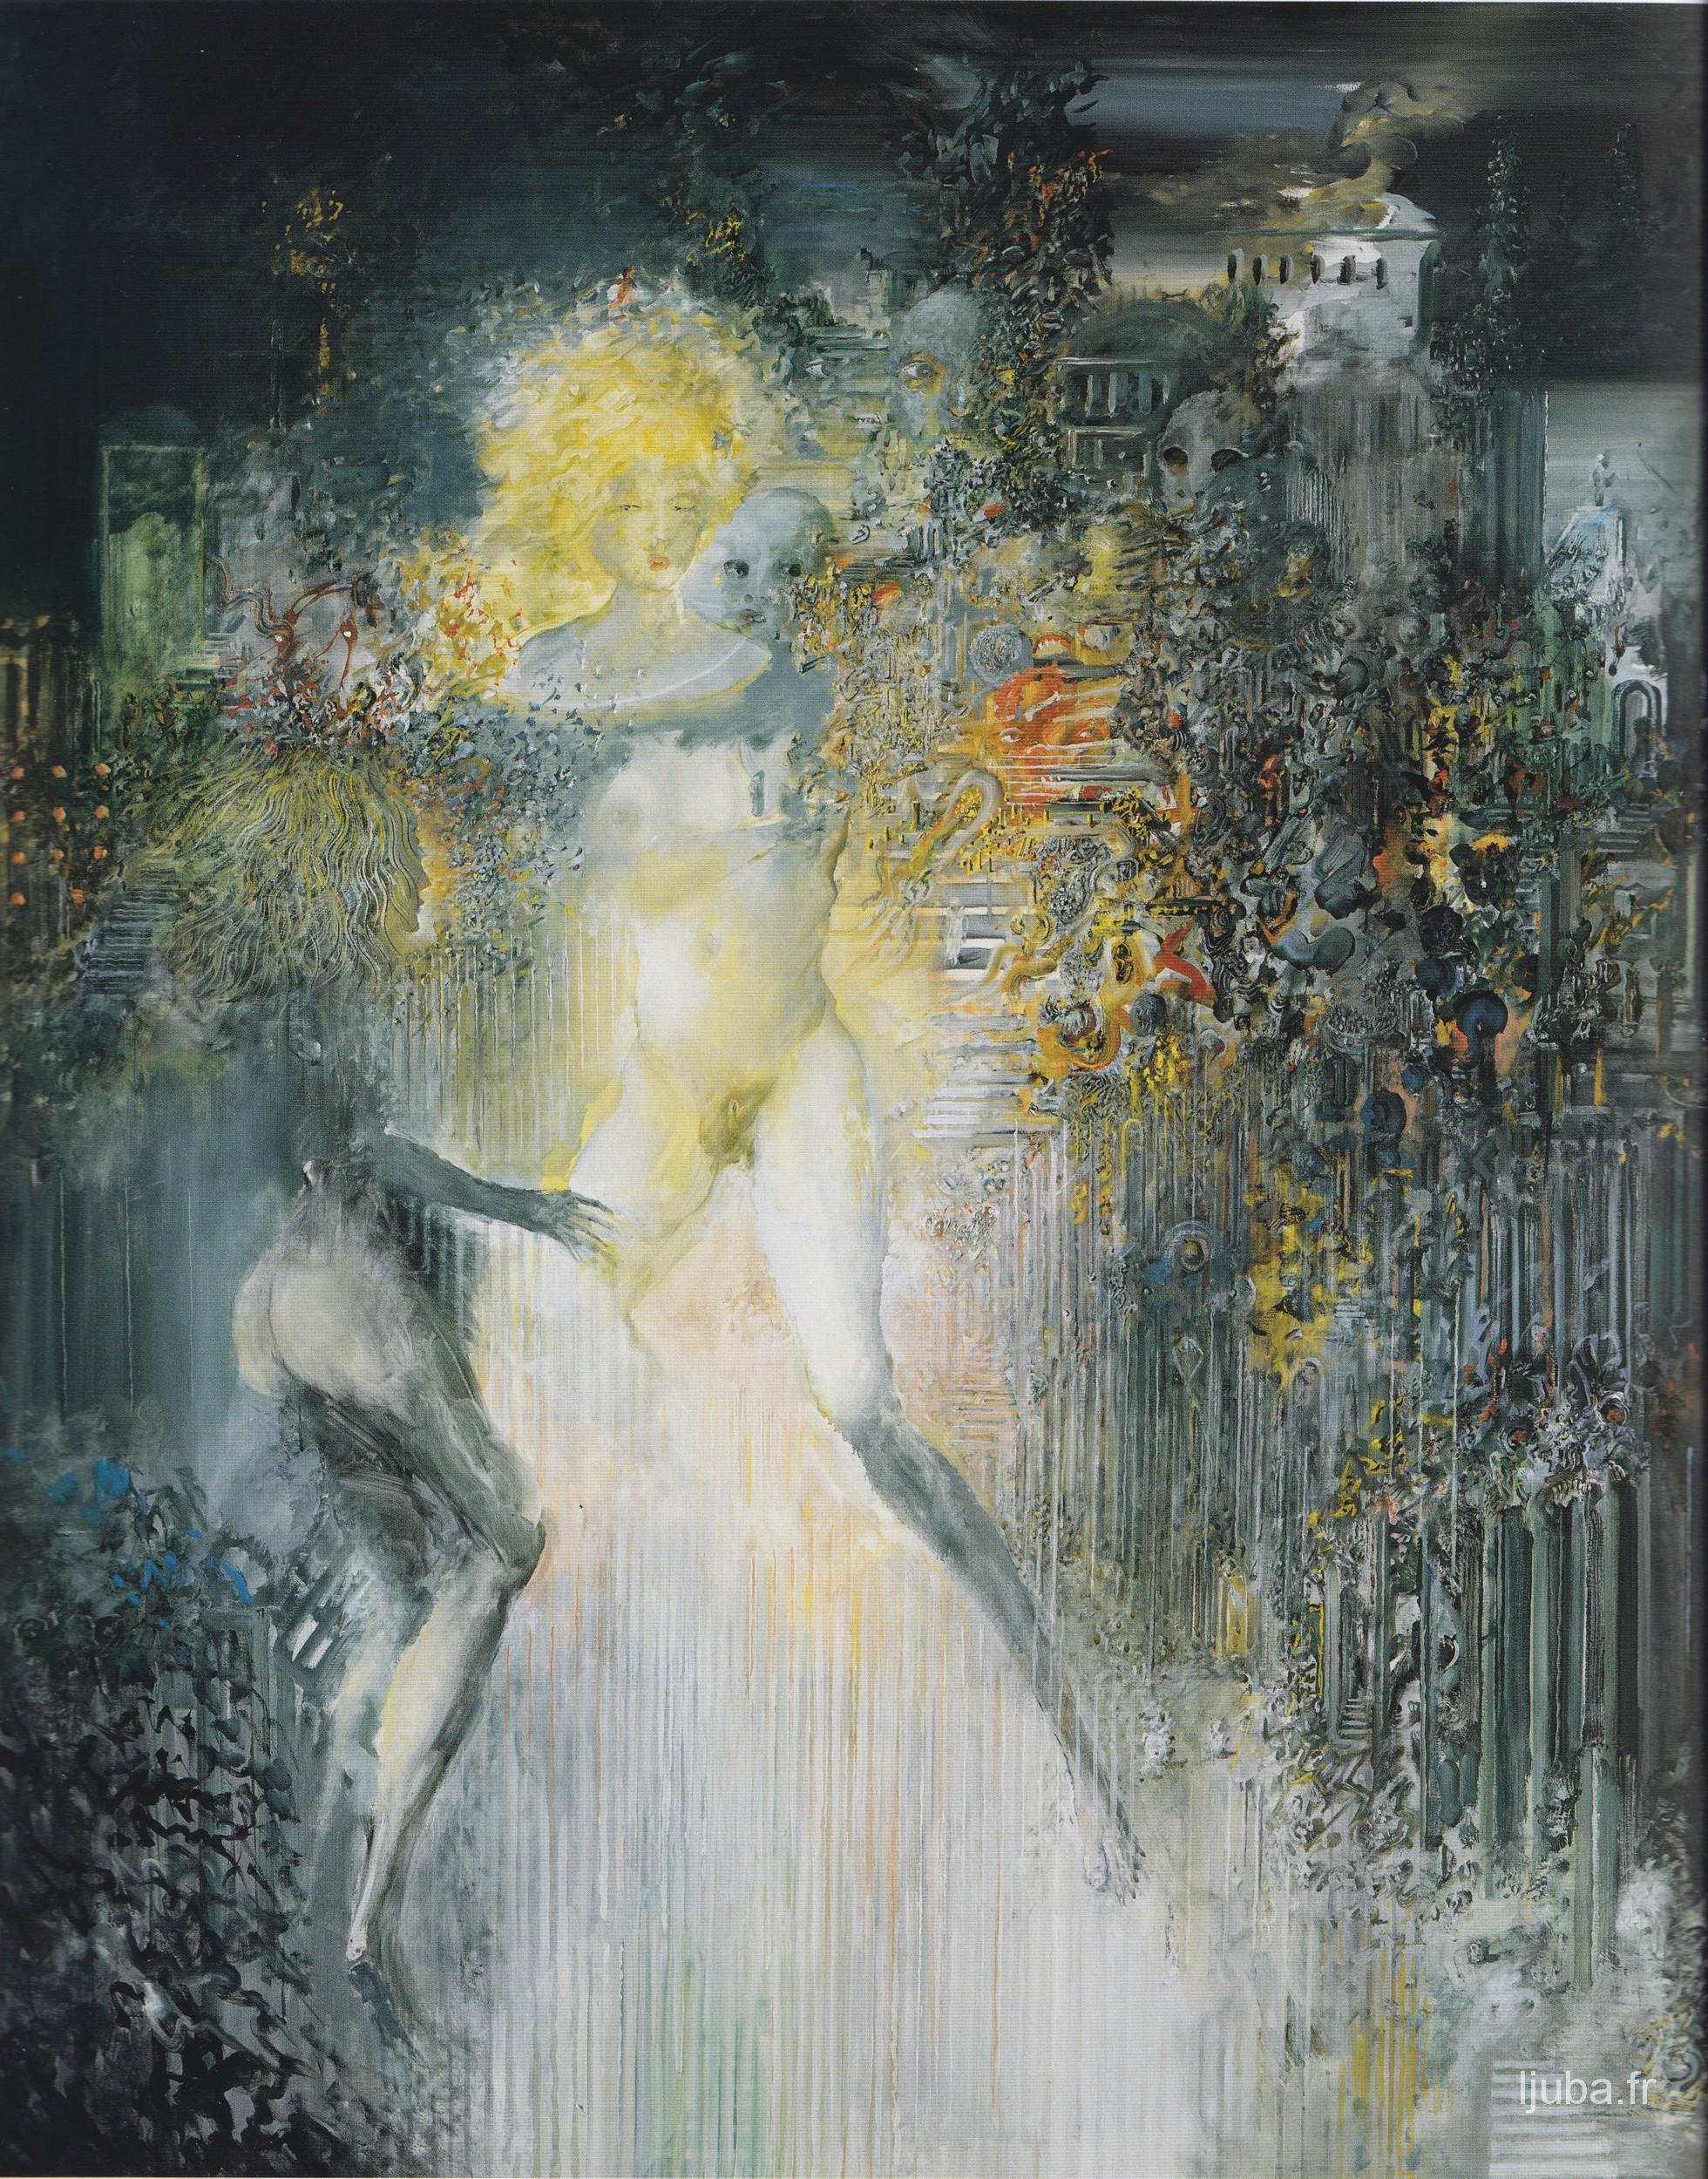 Ljuba Popovic - 2002-99, Ponor za anđela